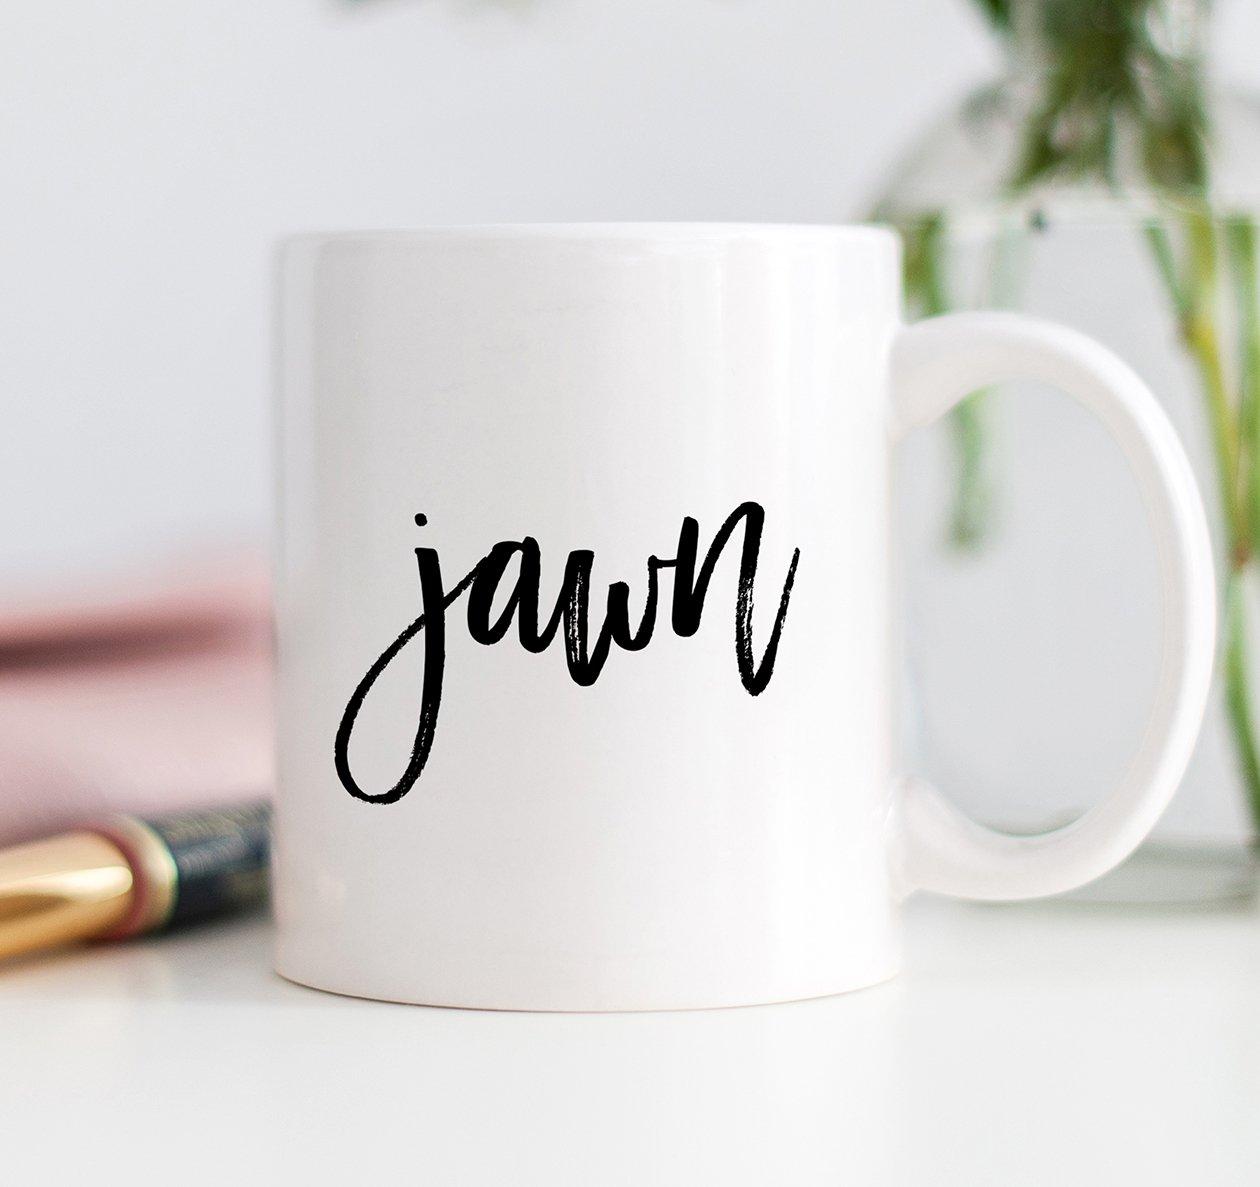 jawn Philly Coffee Mug Philadelphia Gift Funny Cool Phila Hip Hop Urban Birthday Christmas Idea for Son or Daughter - 11oz Ceramic Tea Cup by Digibuddha DM0076